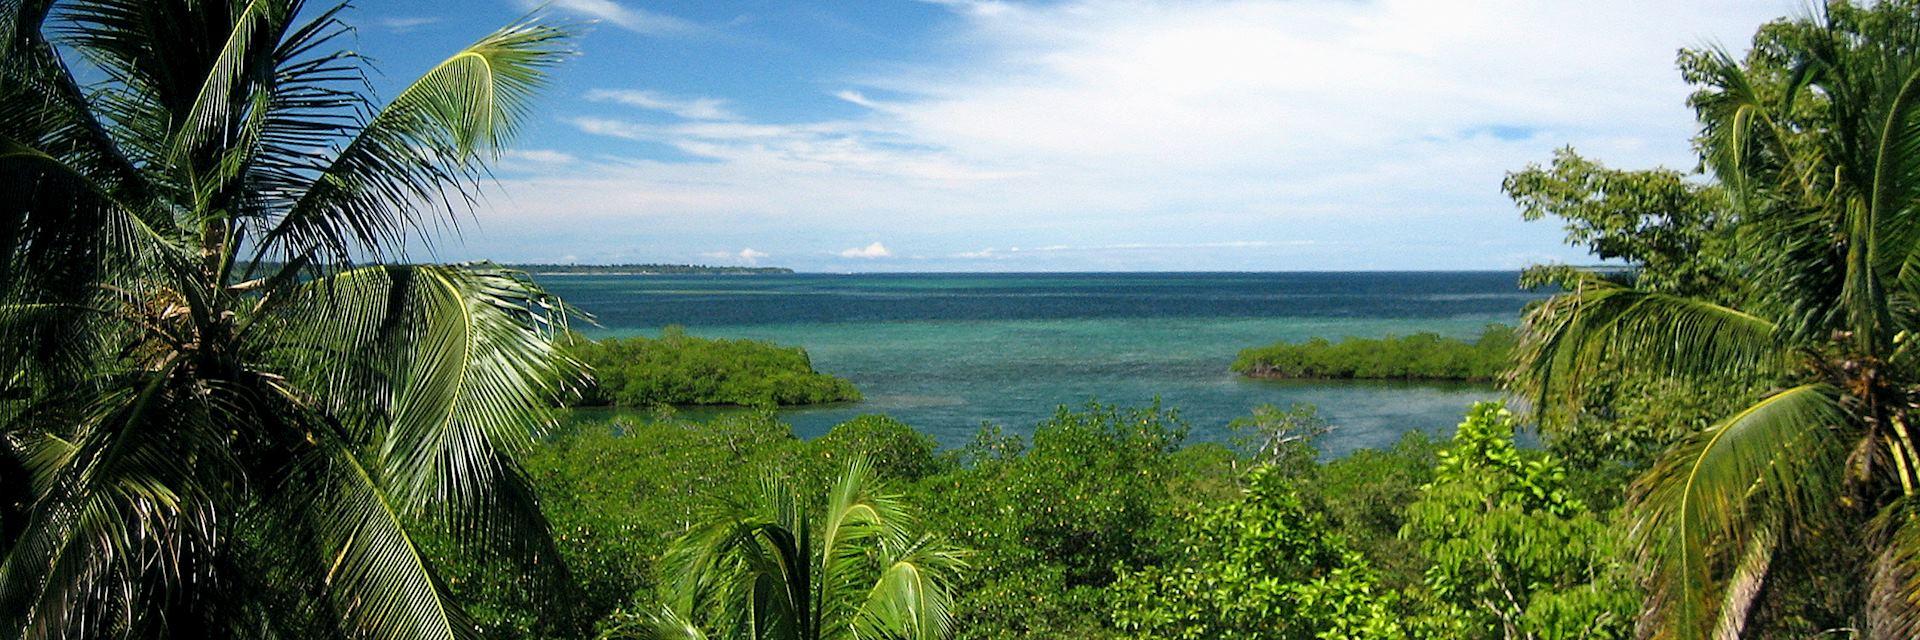 Tranquilo Bay, Panama